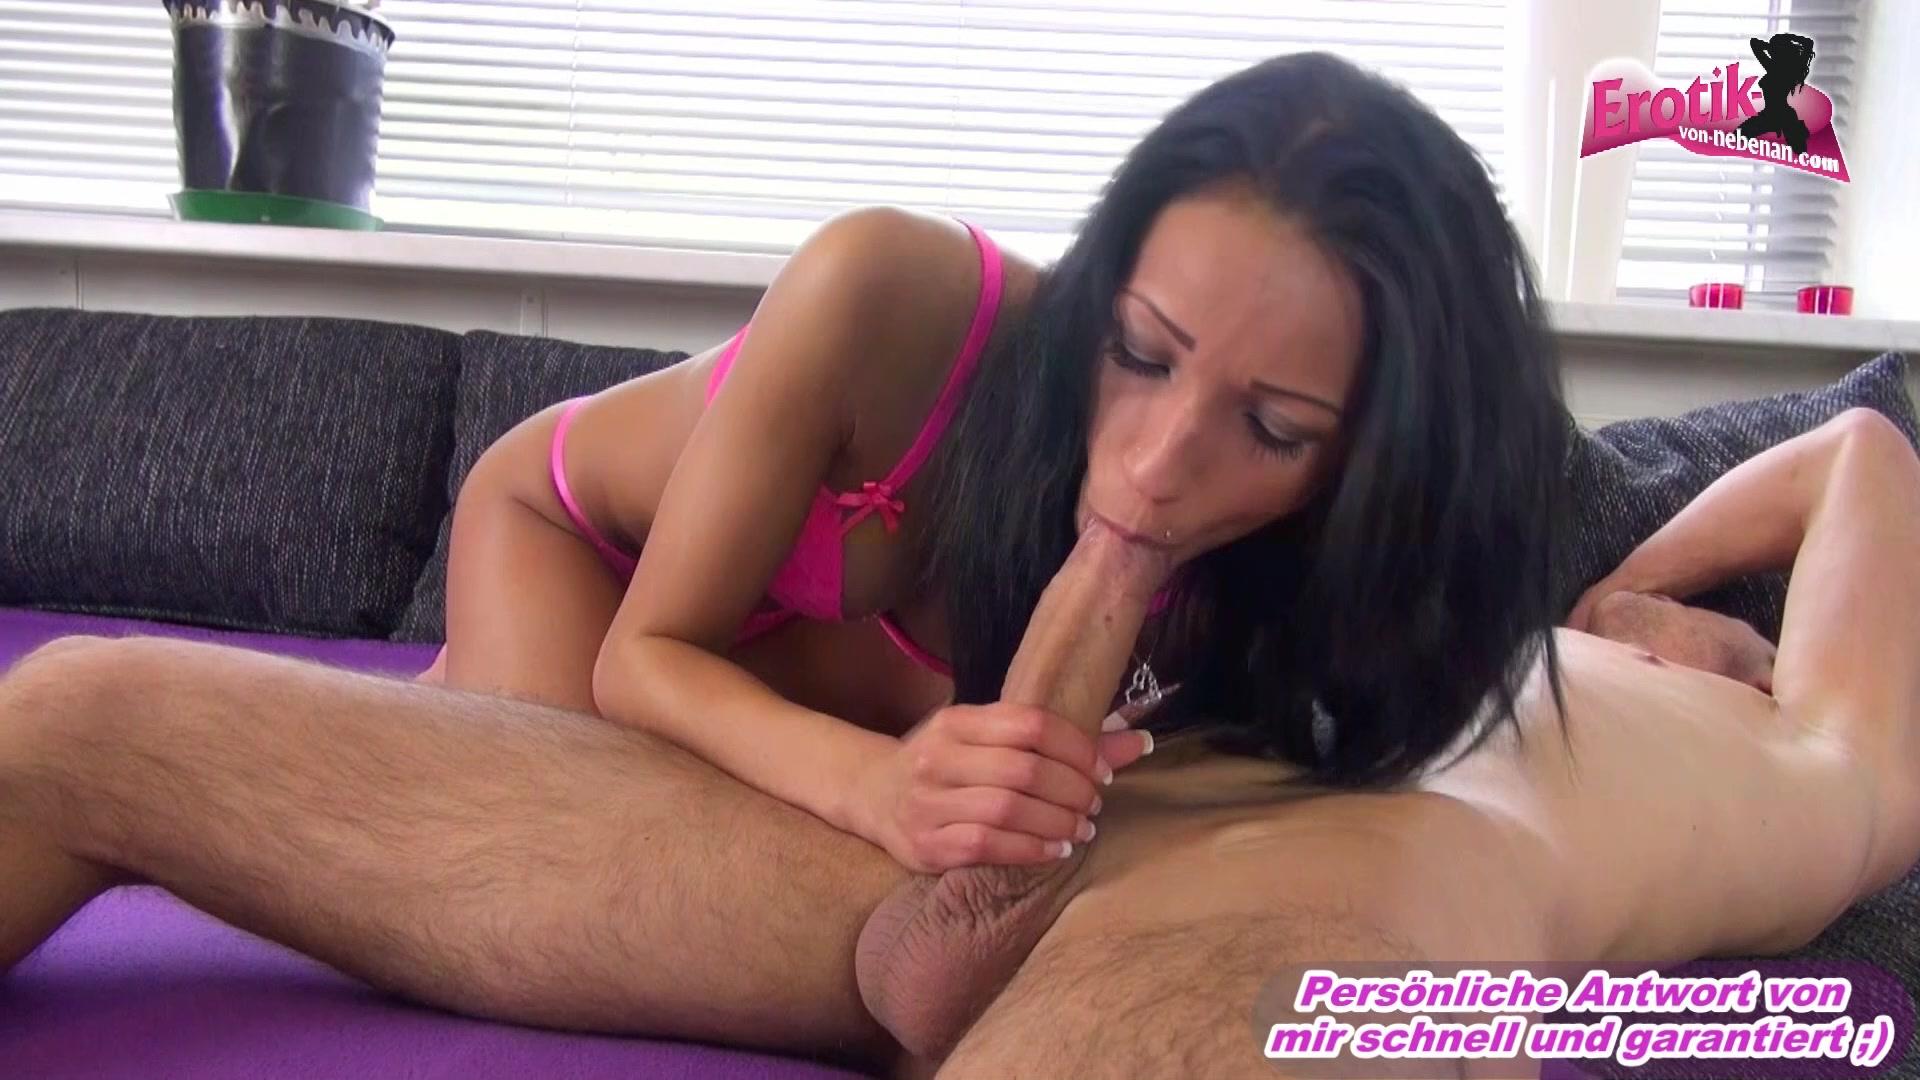 German Latina Teen Threesome Fail At First Porn Casting -9547